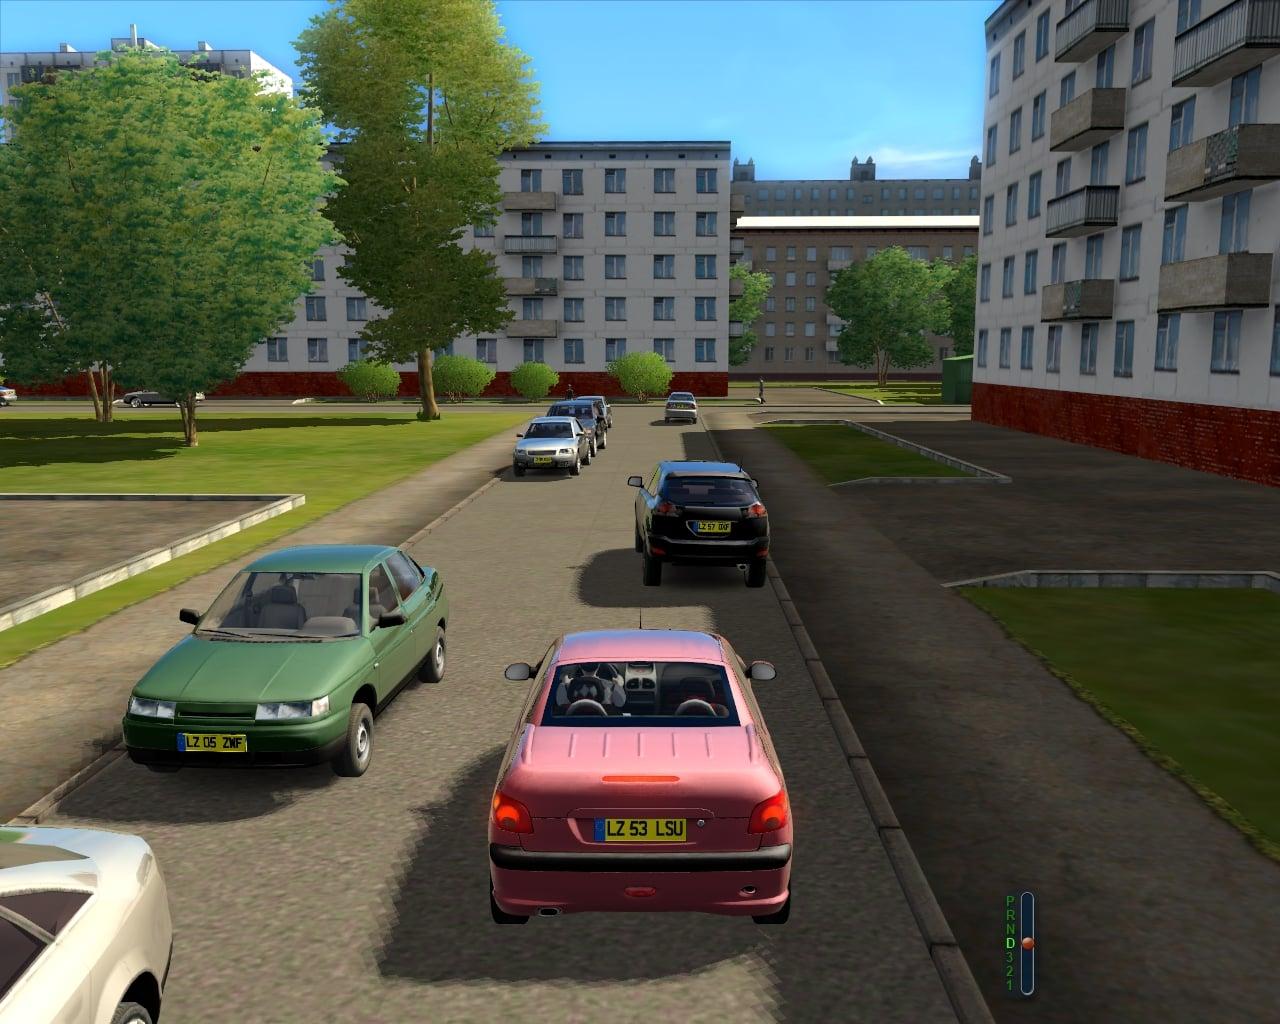 City Car Driving Simulator Download Softonic